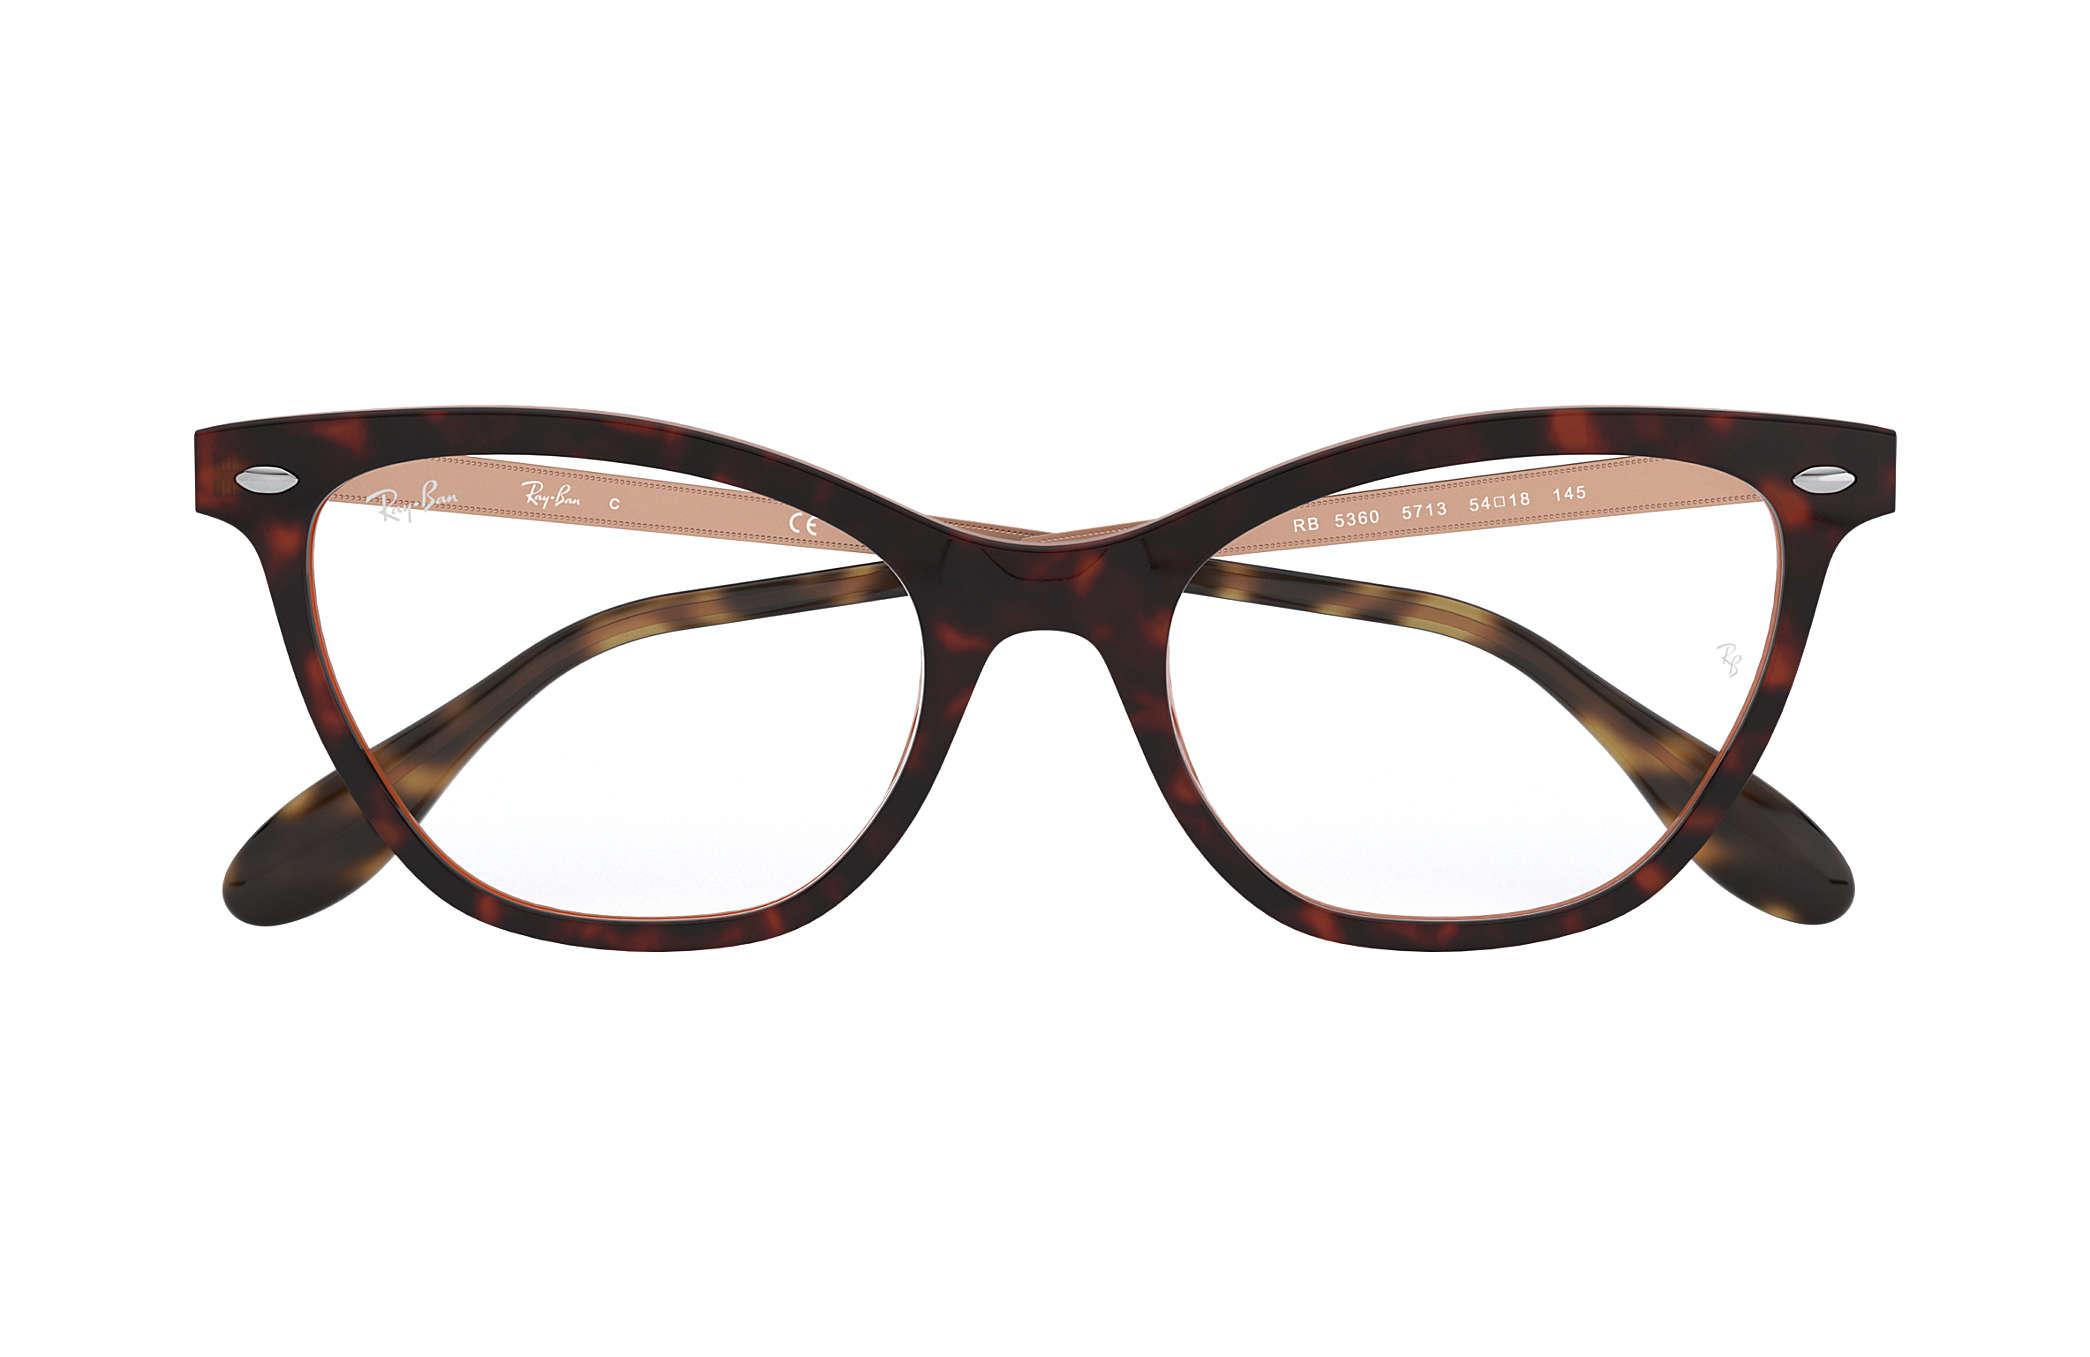 Ray-Ban prescription glasses RB5360 Tortoise - Acetate ... 4d3ae6484489